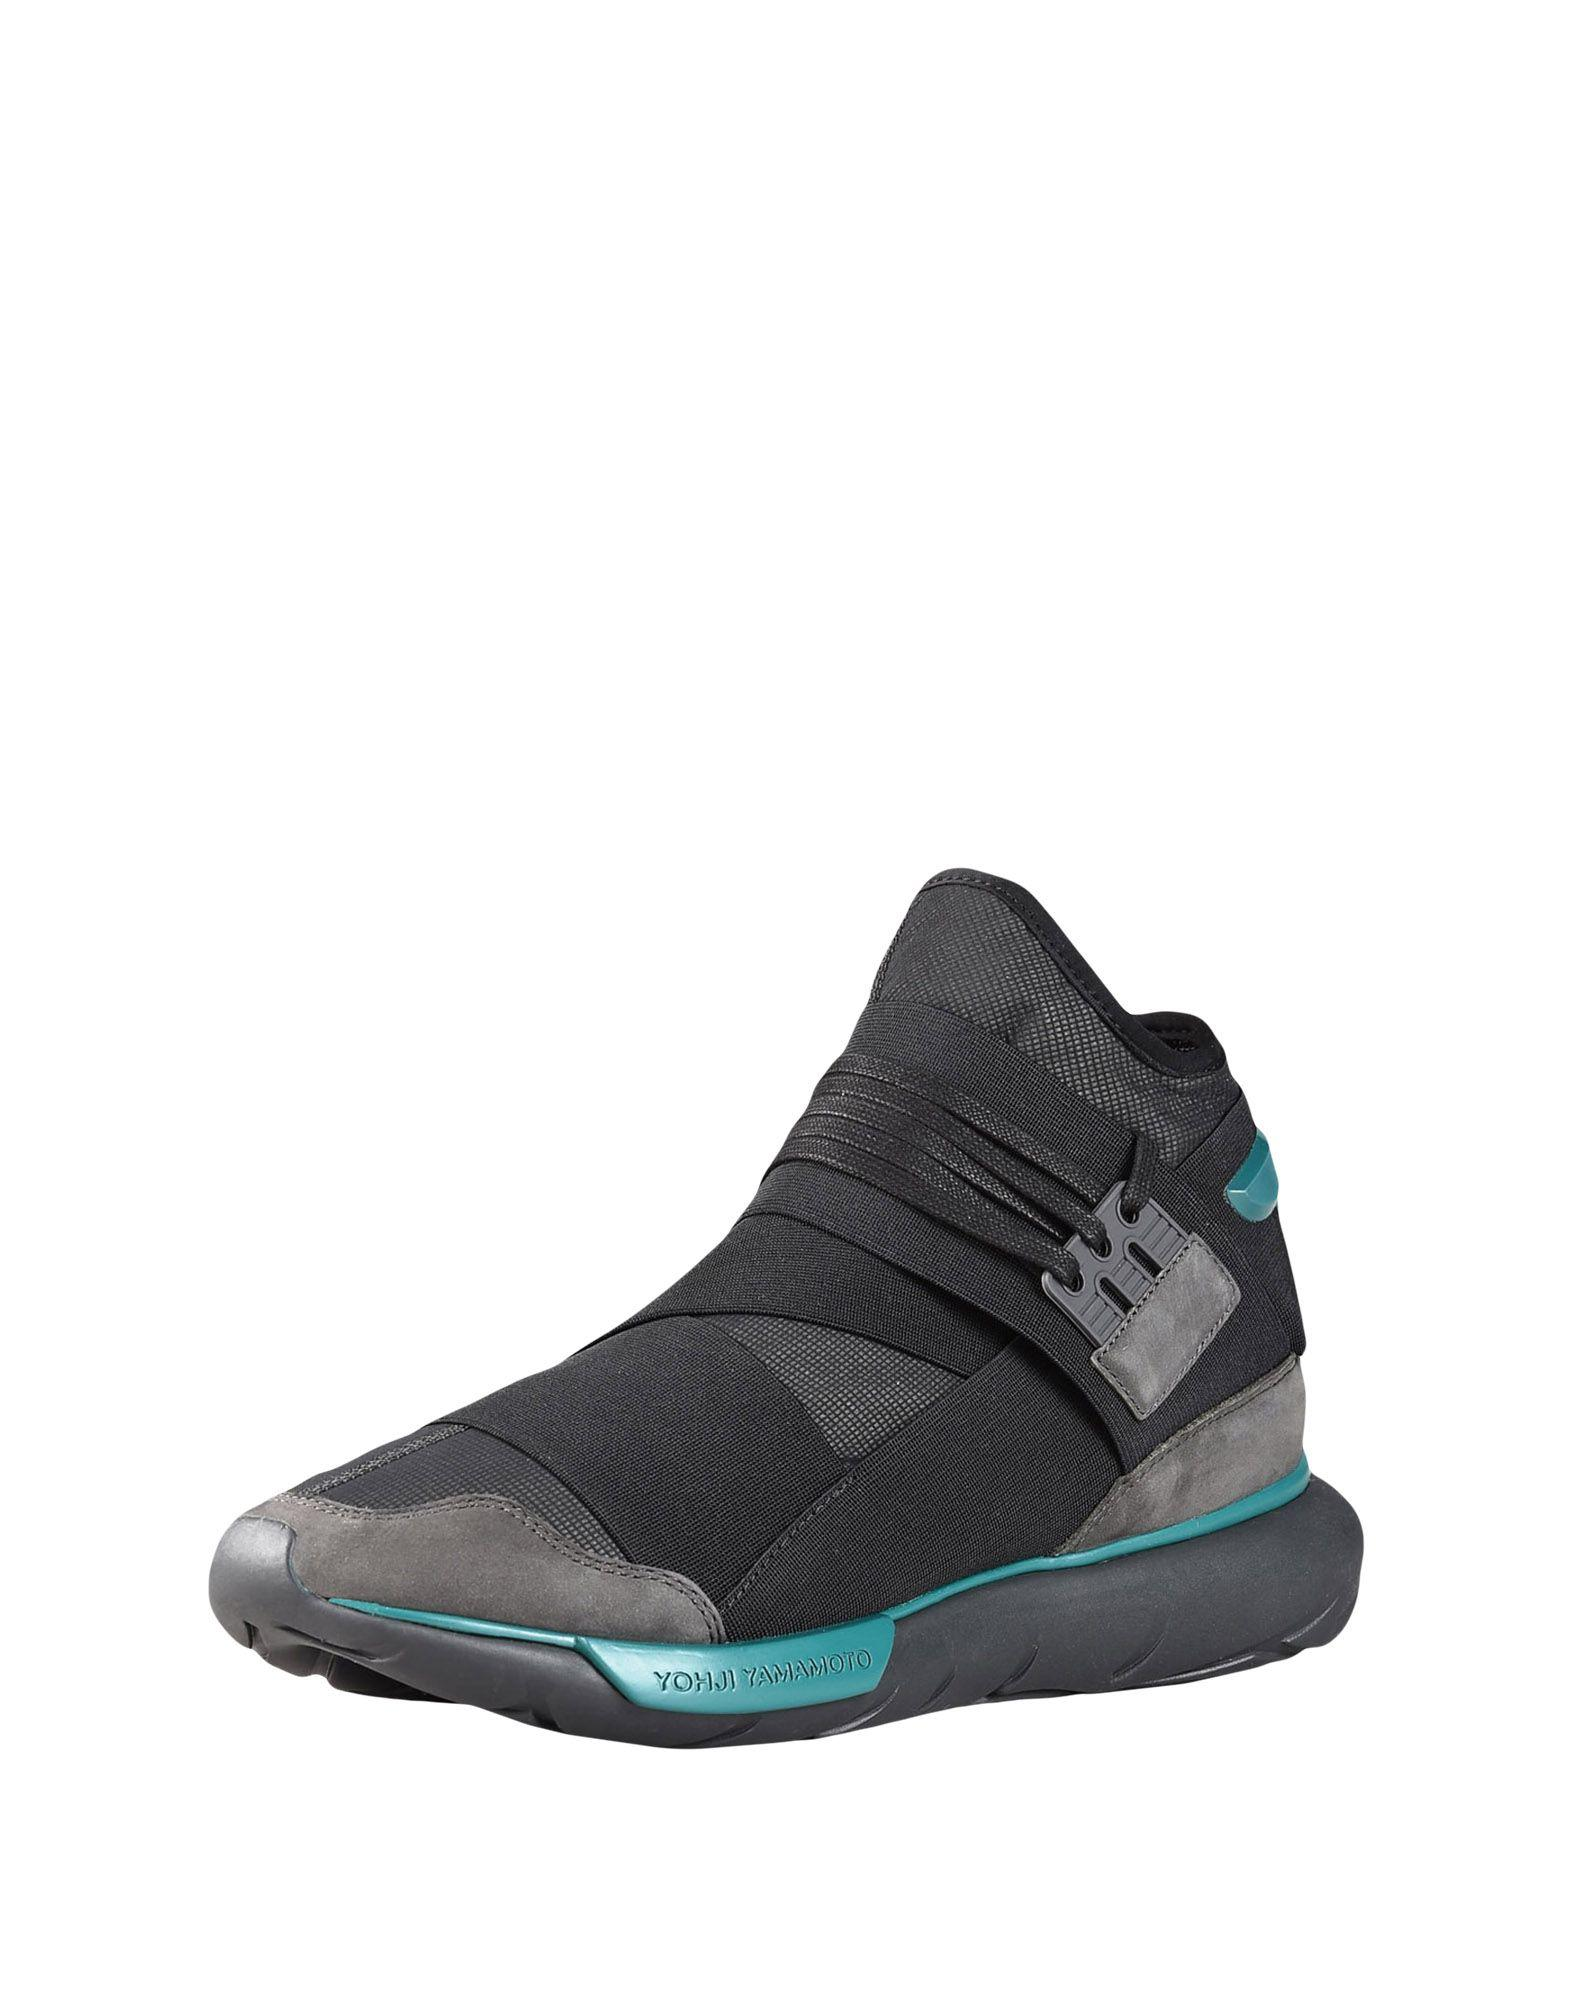 0e39087deb068 Lyst - Y-3 Qasa Neoprene High-top Sneakers in Black for Men - Save 61%